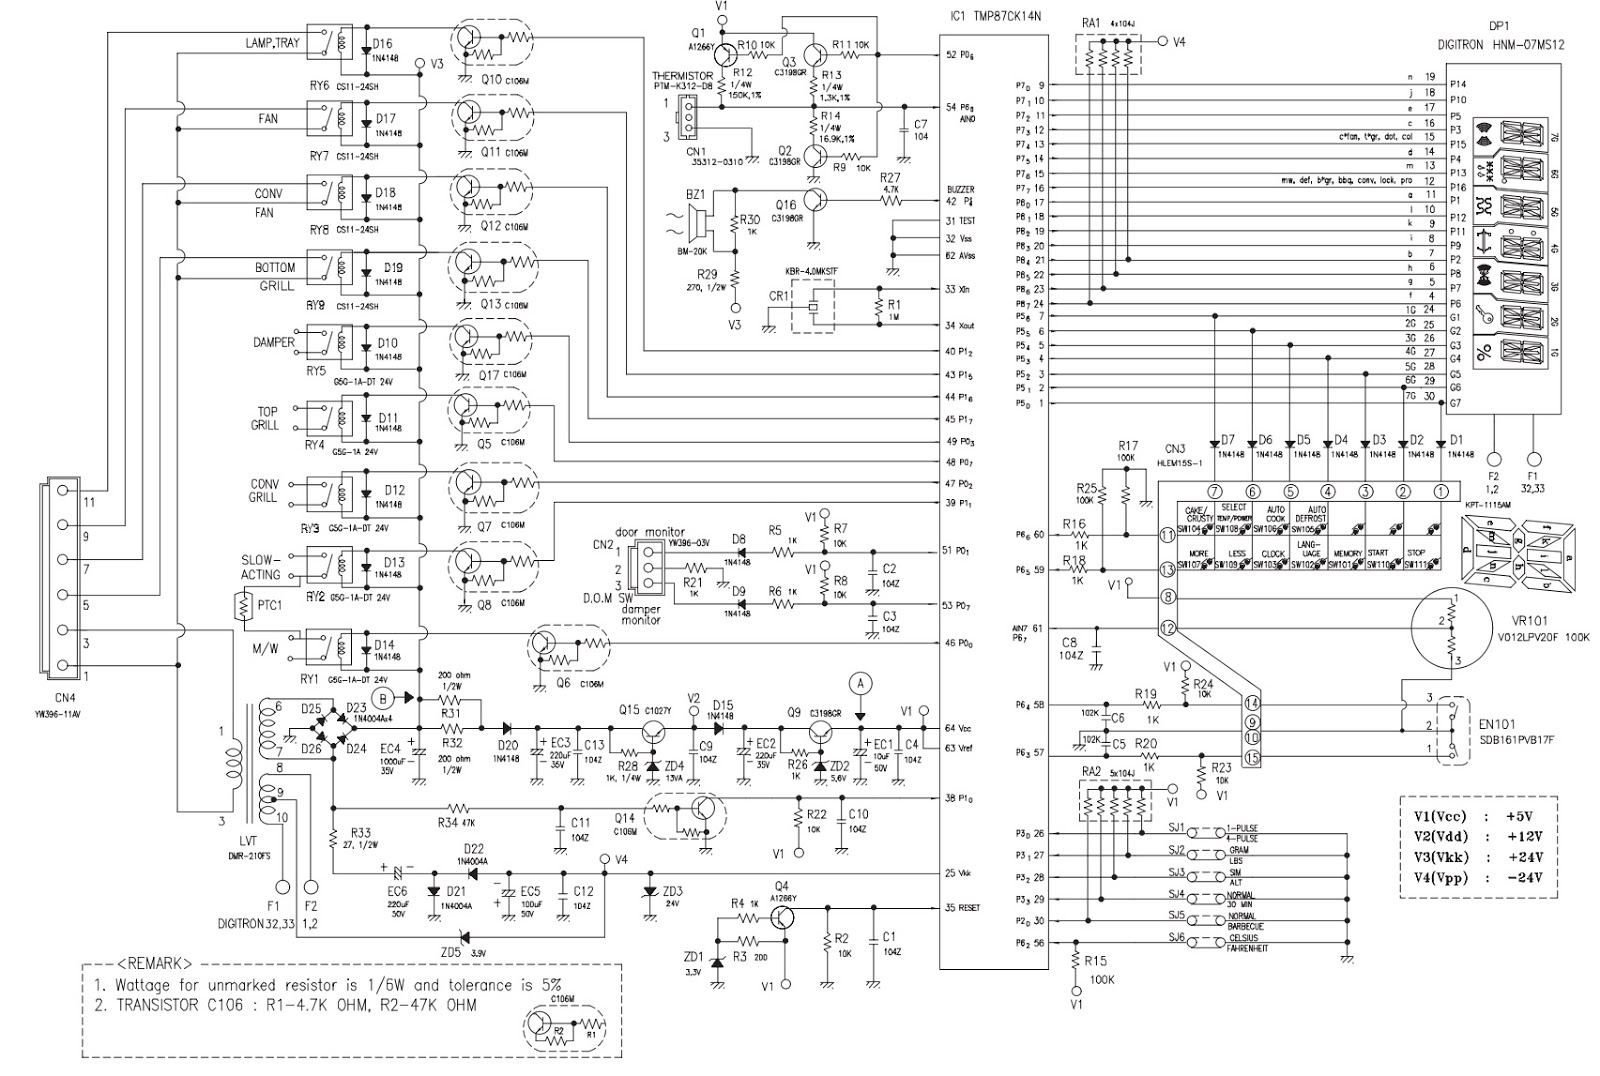 hight resolution of maytag microwave wiring diagram basic electronics wiring diagram maytag oven wiring diagram wrg 1374 maytag